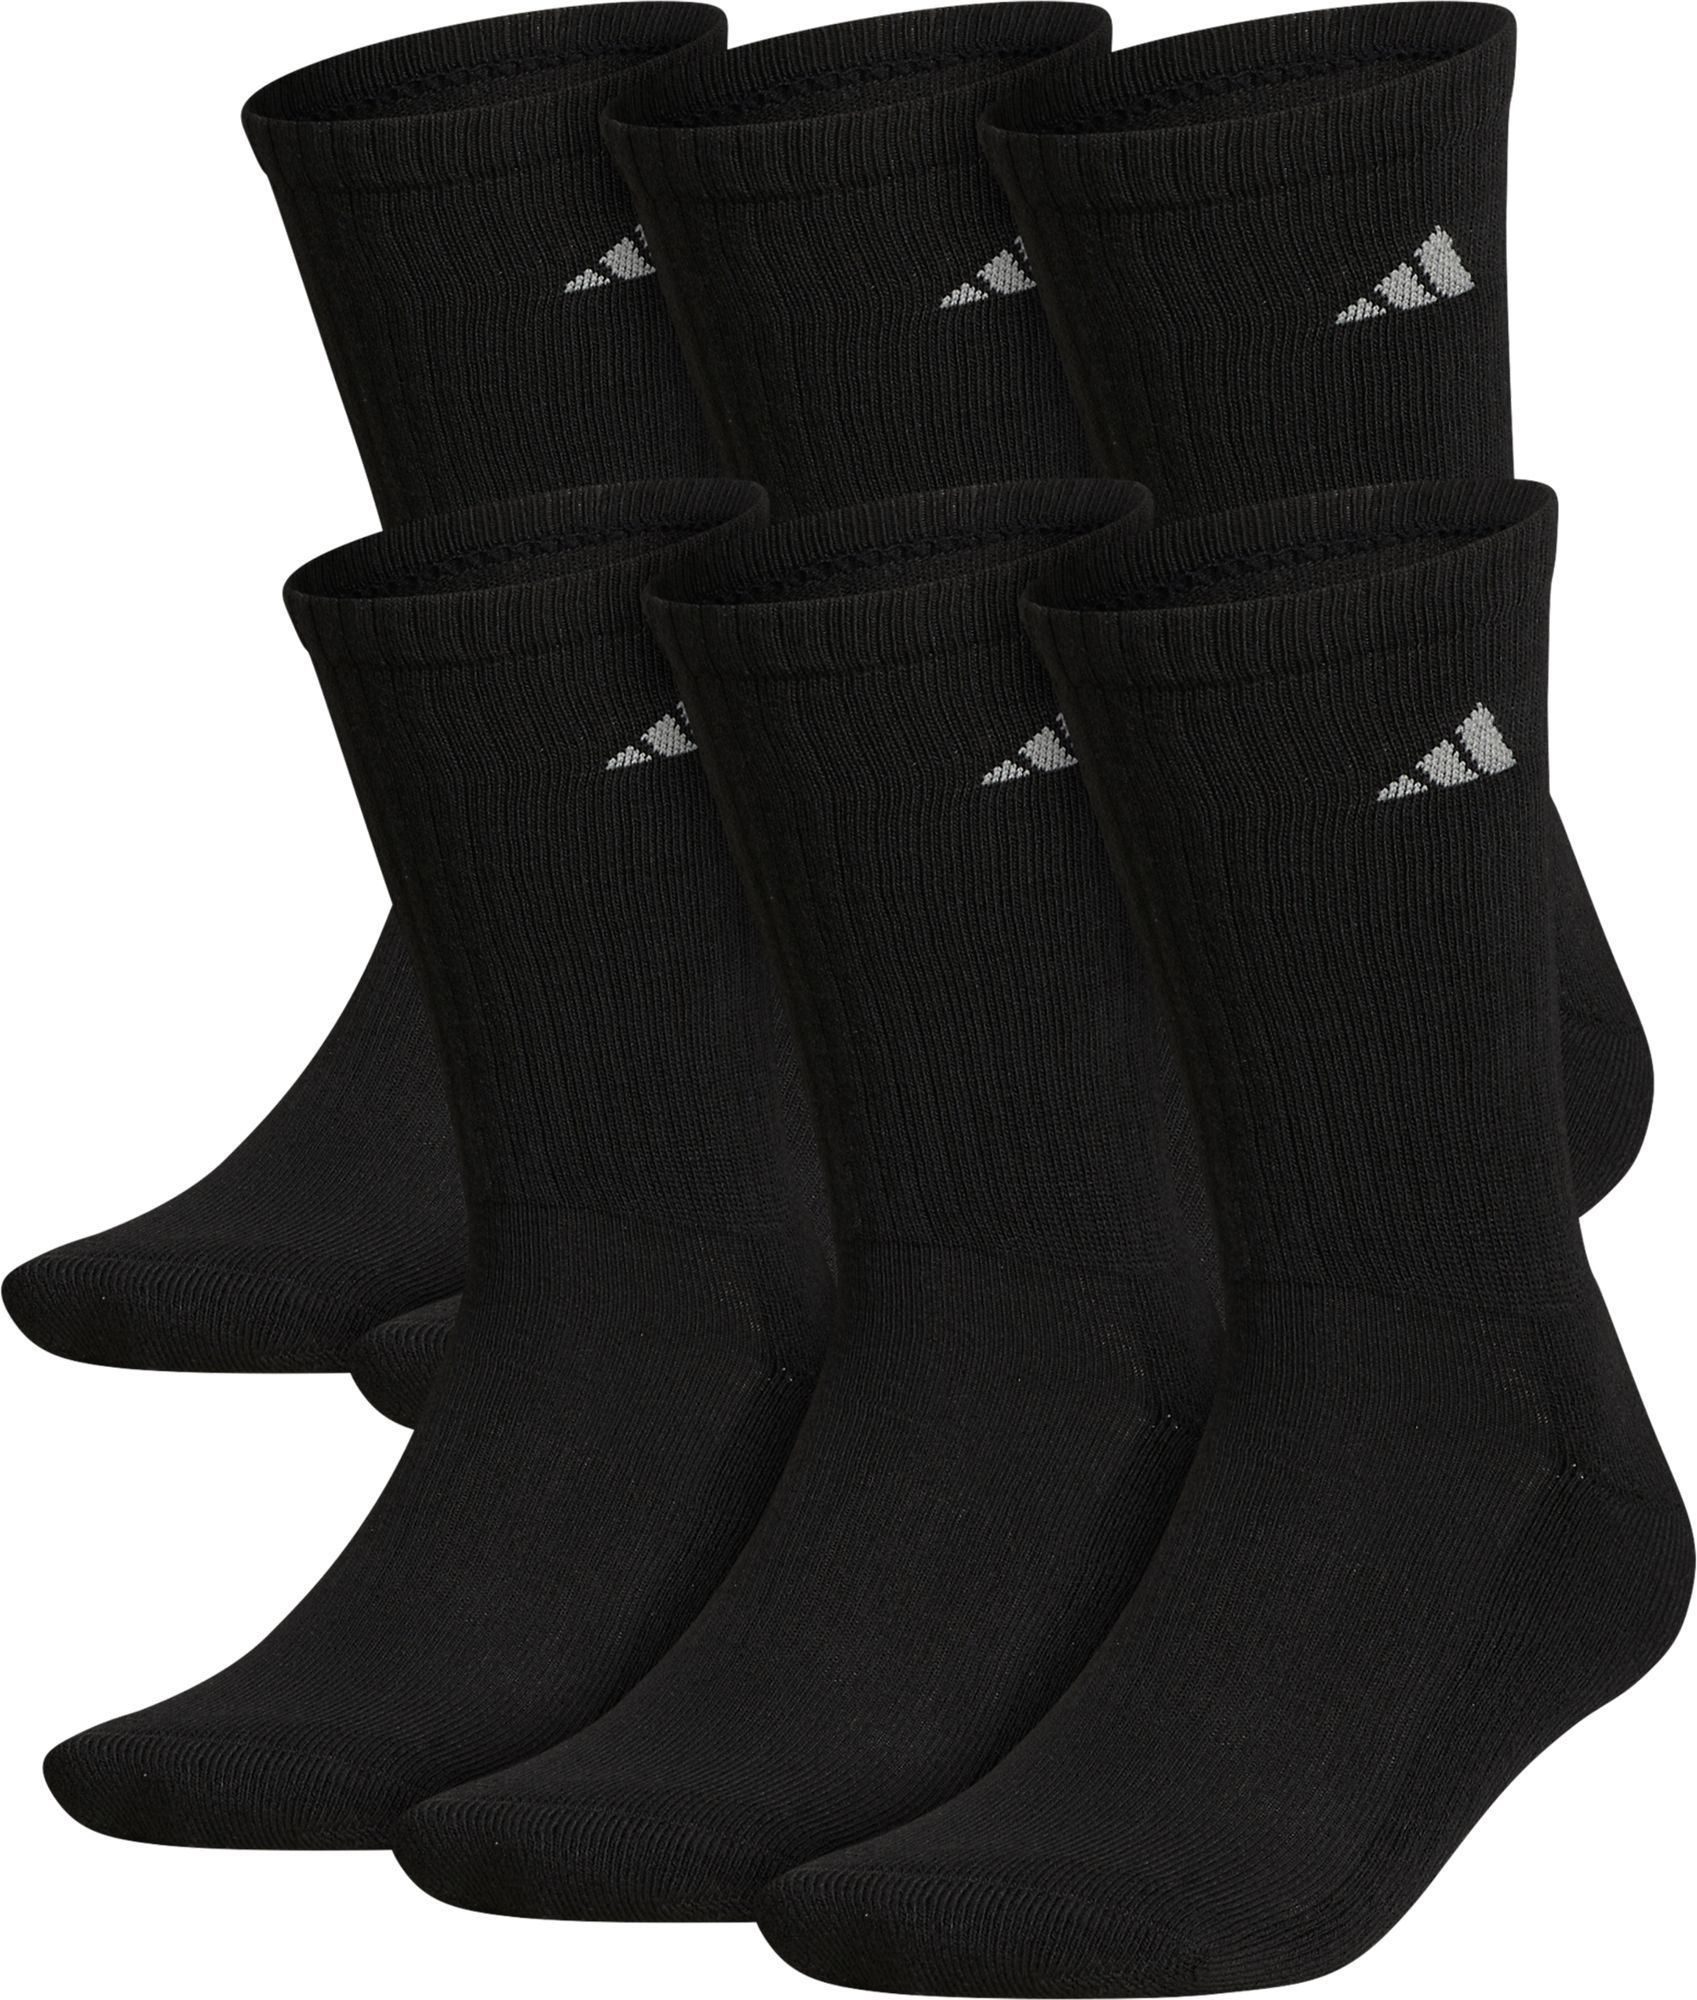 1f759841e adidas Men's Athletic Crew Socks 6 Pack | DICK'S Sporting ...